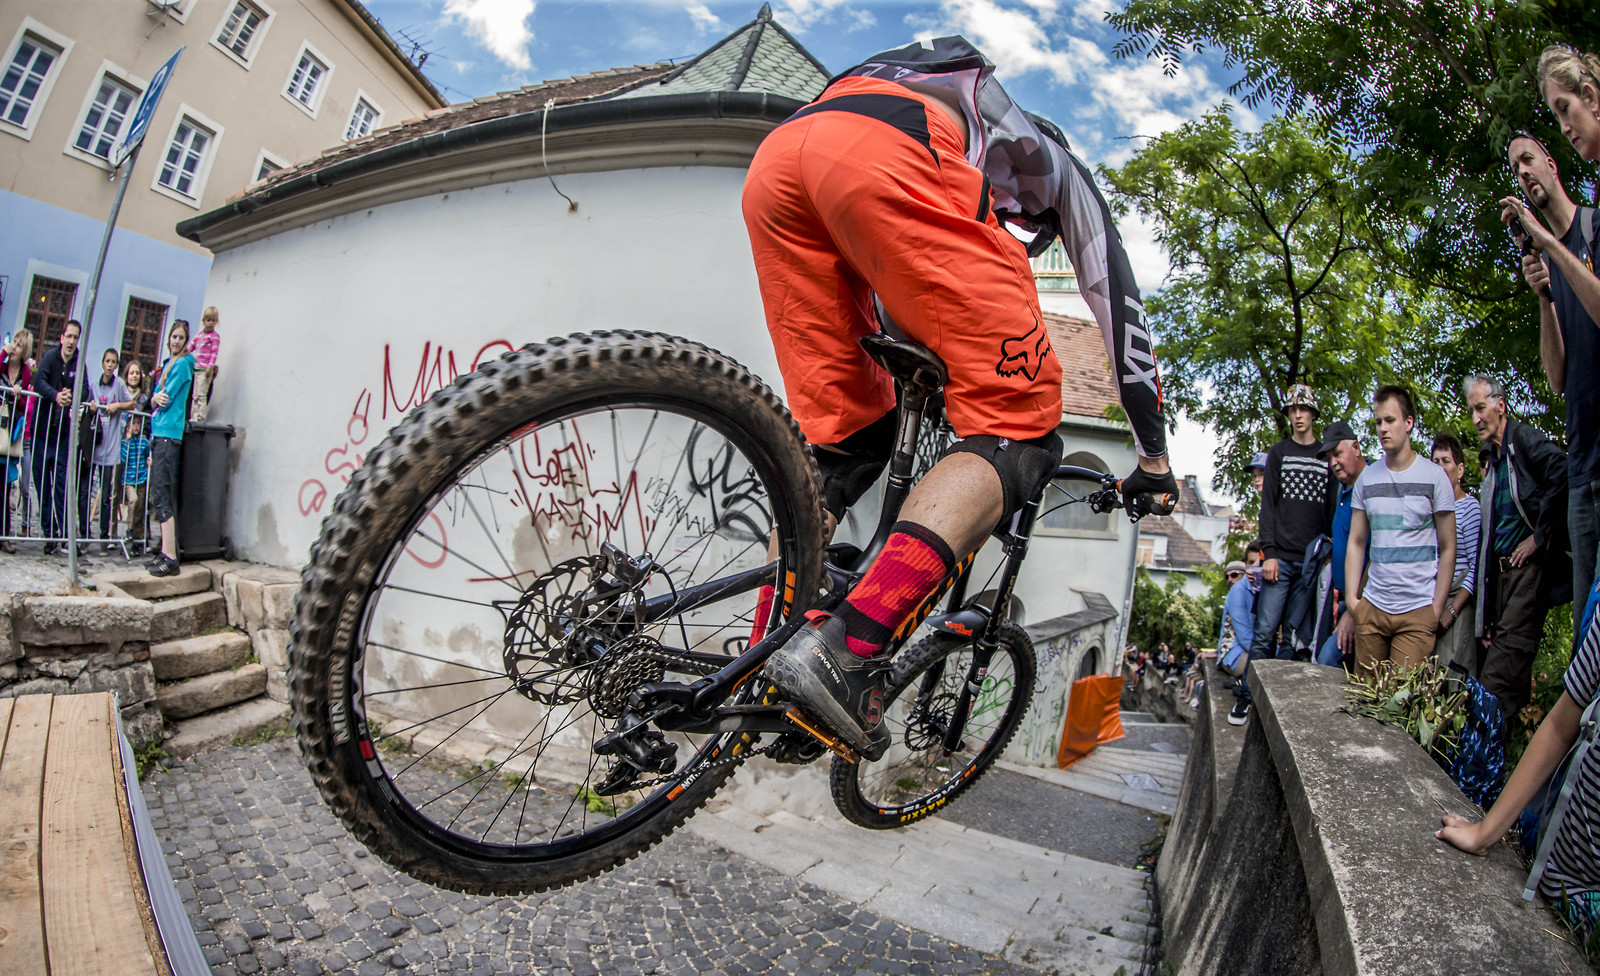 fearon city downhill slovenia - phunkt.com - Mountain Biking Pictures - Vital MTB